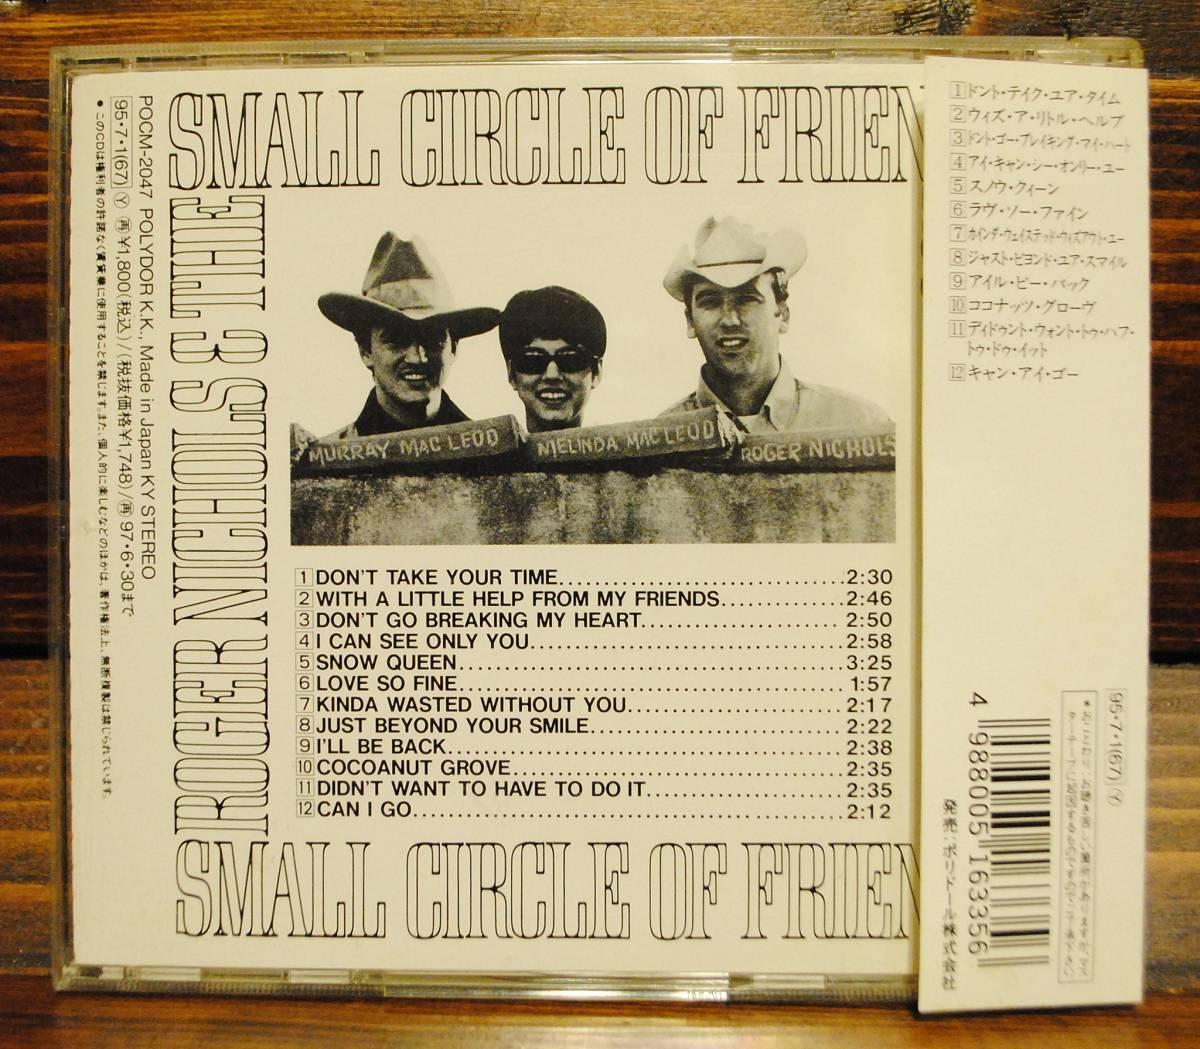 ●CD● Roger Nichols & The Small Circle Of Friends / 1995年 国内盤 / 1967年作品 / 大名盤 / 小西康陽ネタ / 送料_画像2